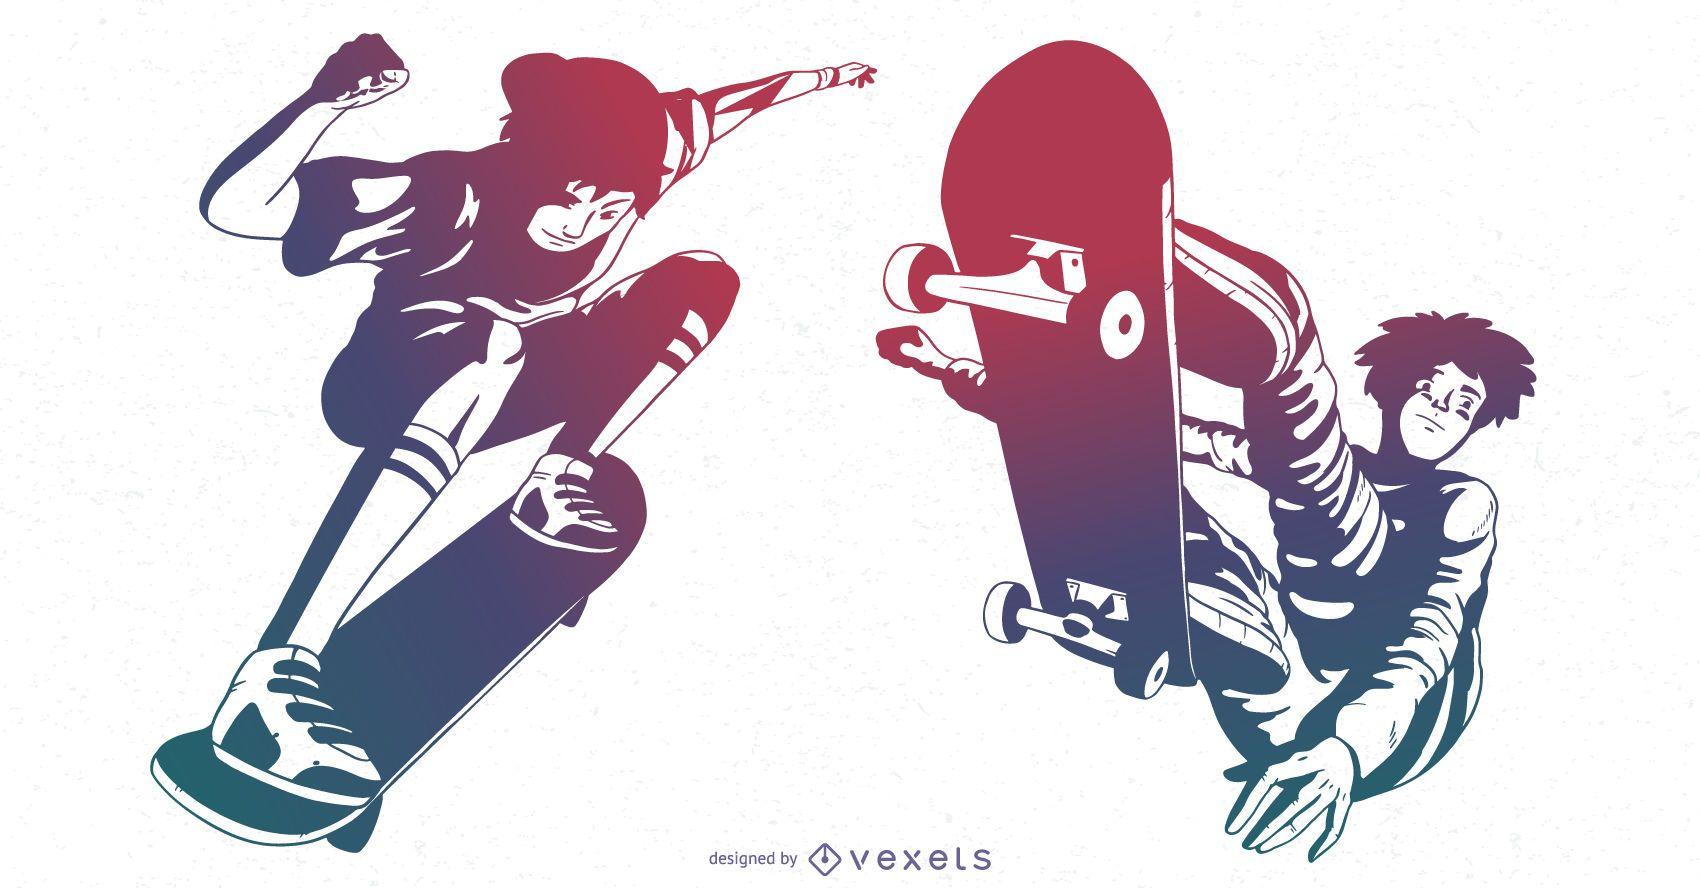 Conjunto de degradado de personajes skater